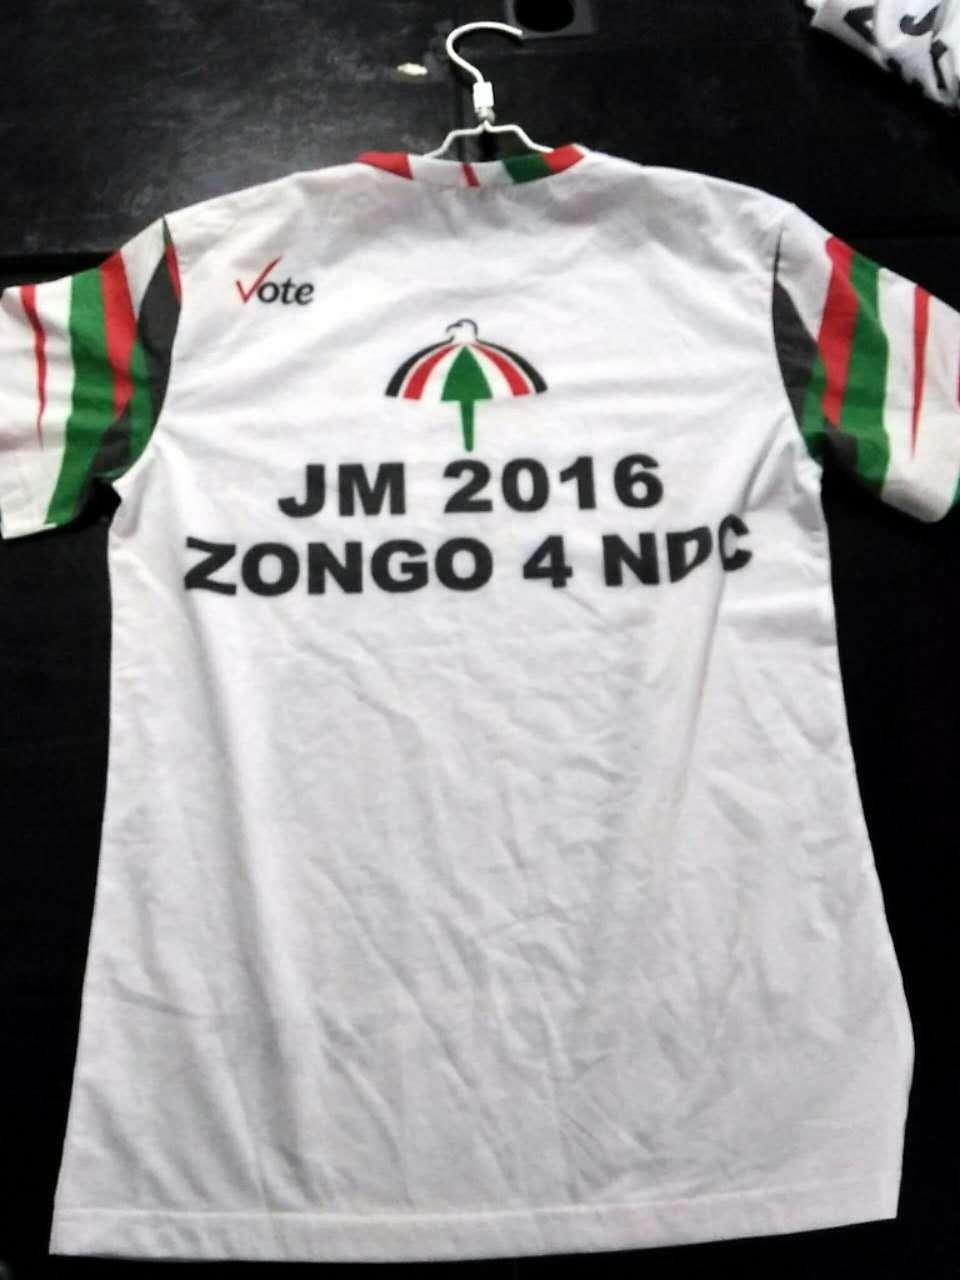 Custom Cheap Wwwxxxcom Tshirt Plain White Election Campaign Polo Men′s T Shirt Design Printing T-Shirt Men Wholesale China